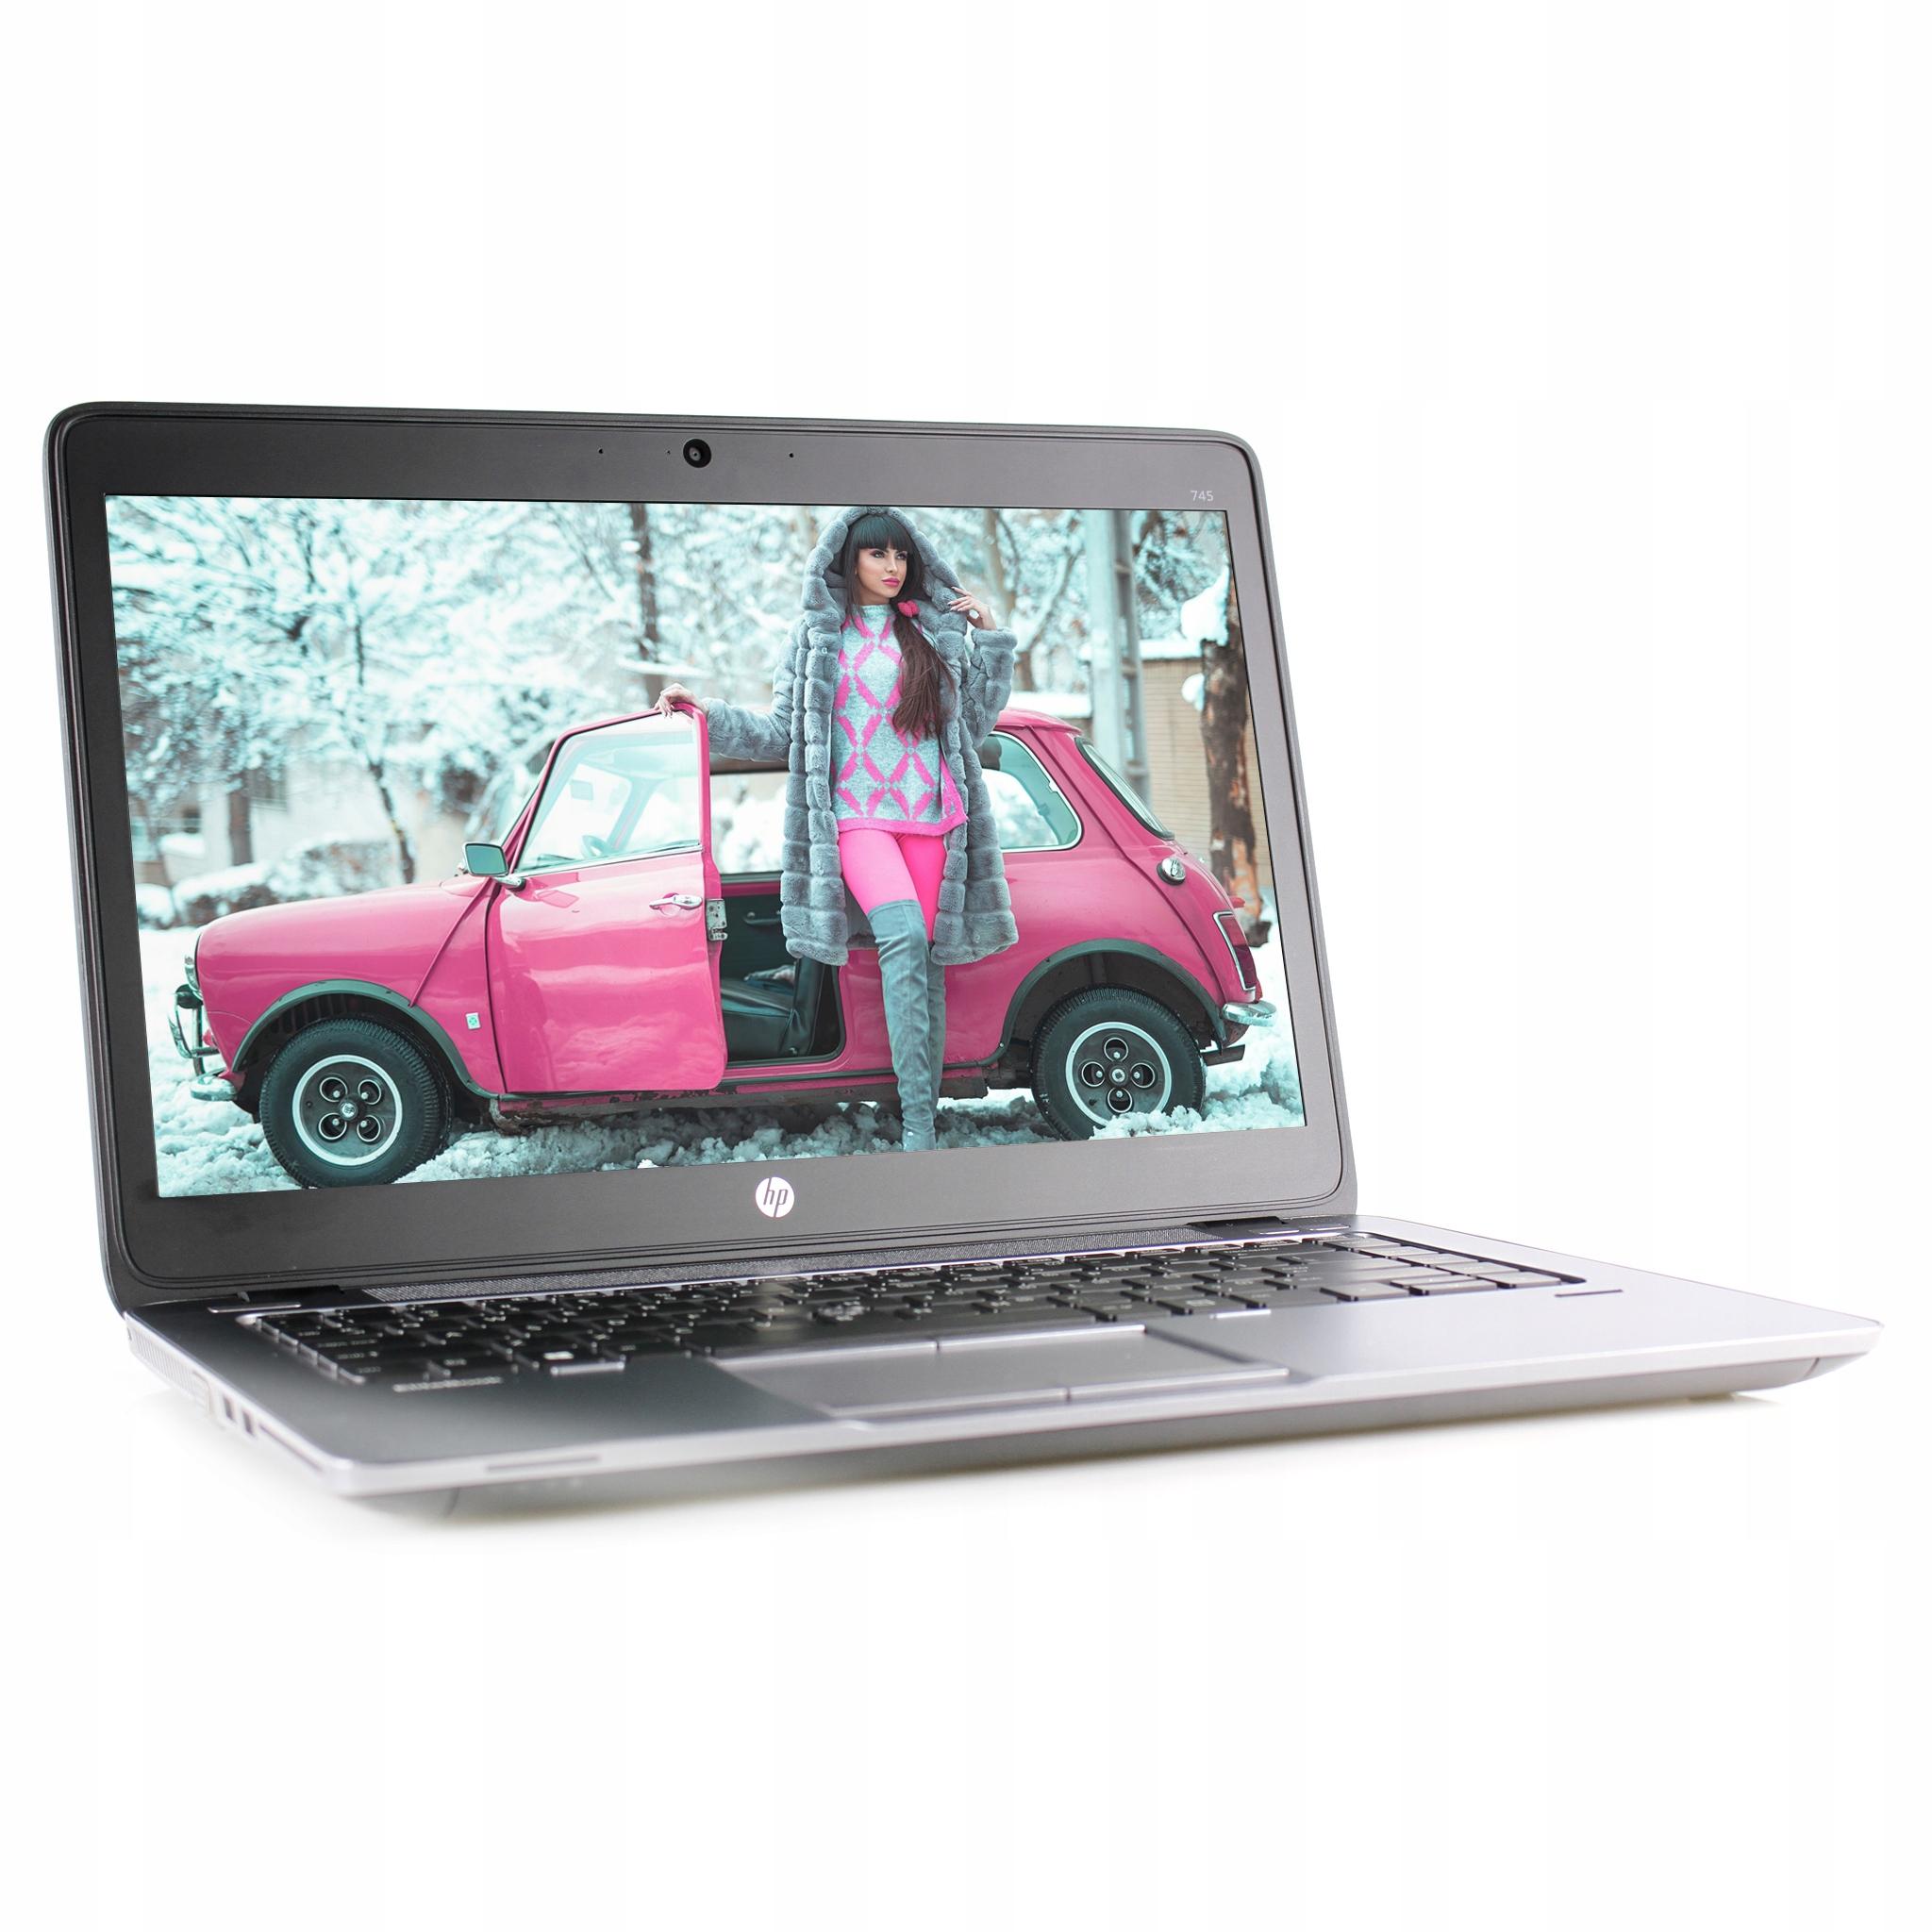 Laptop HP / 4GB / SSD / Win10 / GWARANCJA / SKLEP